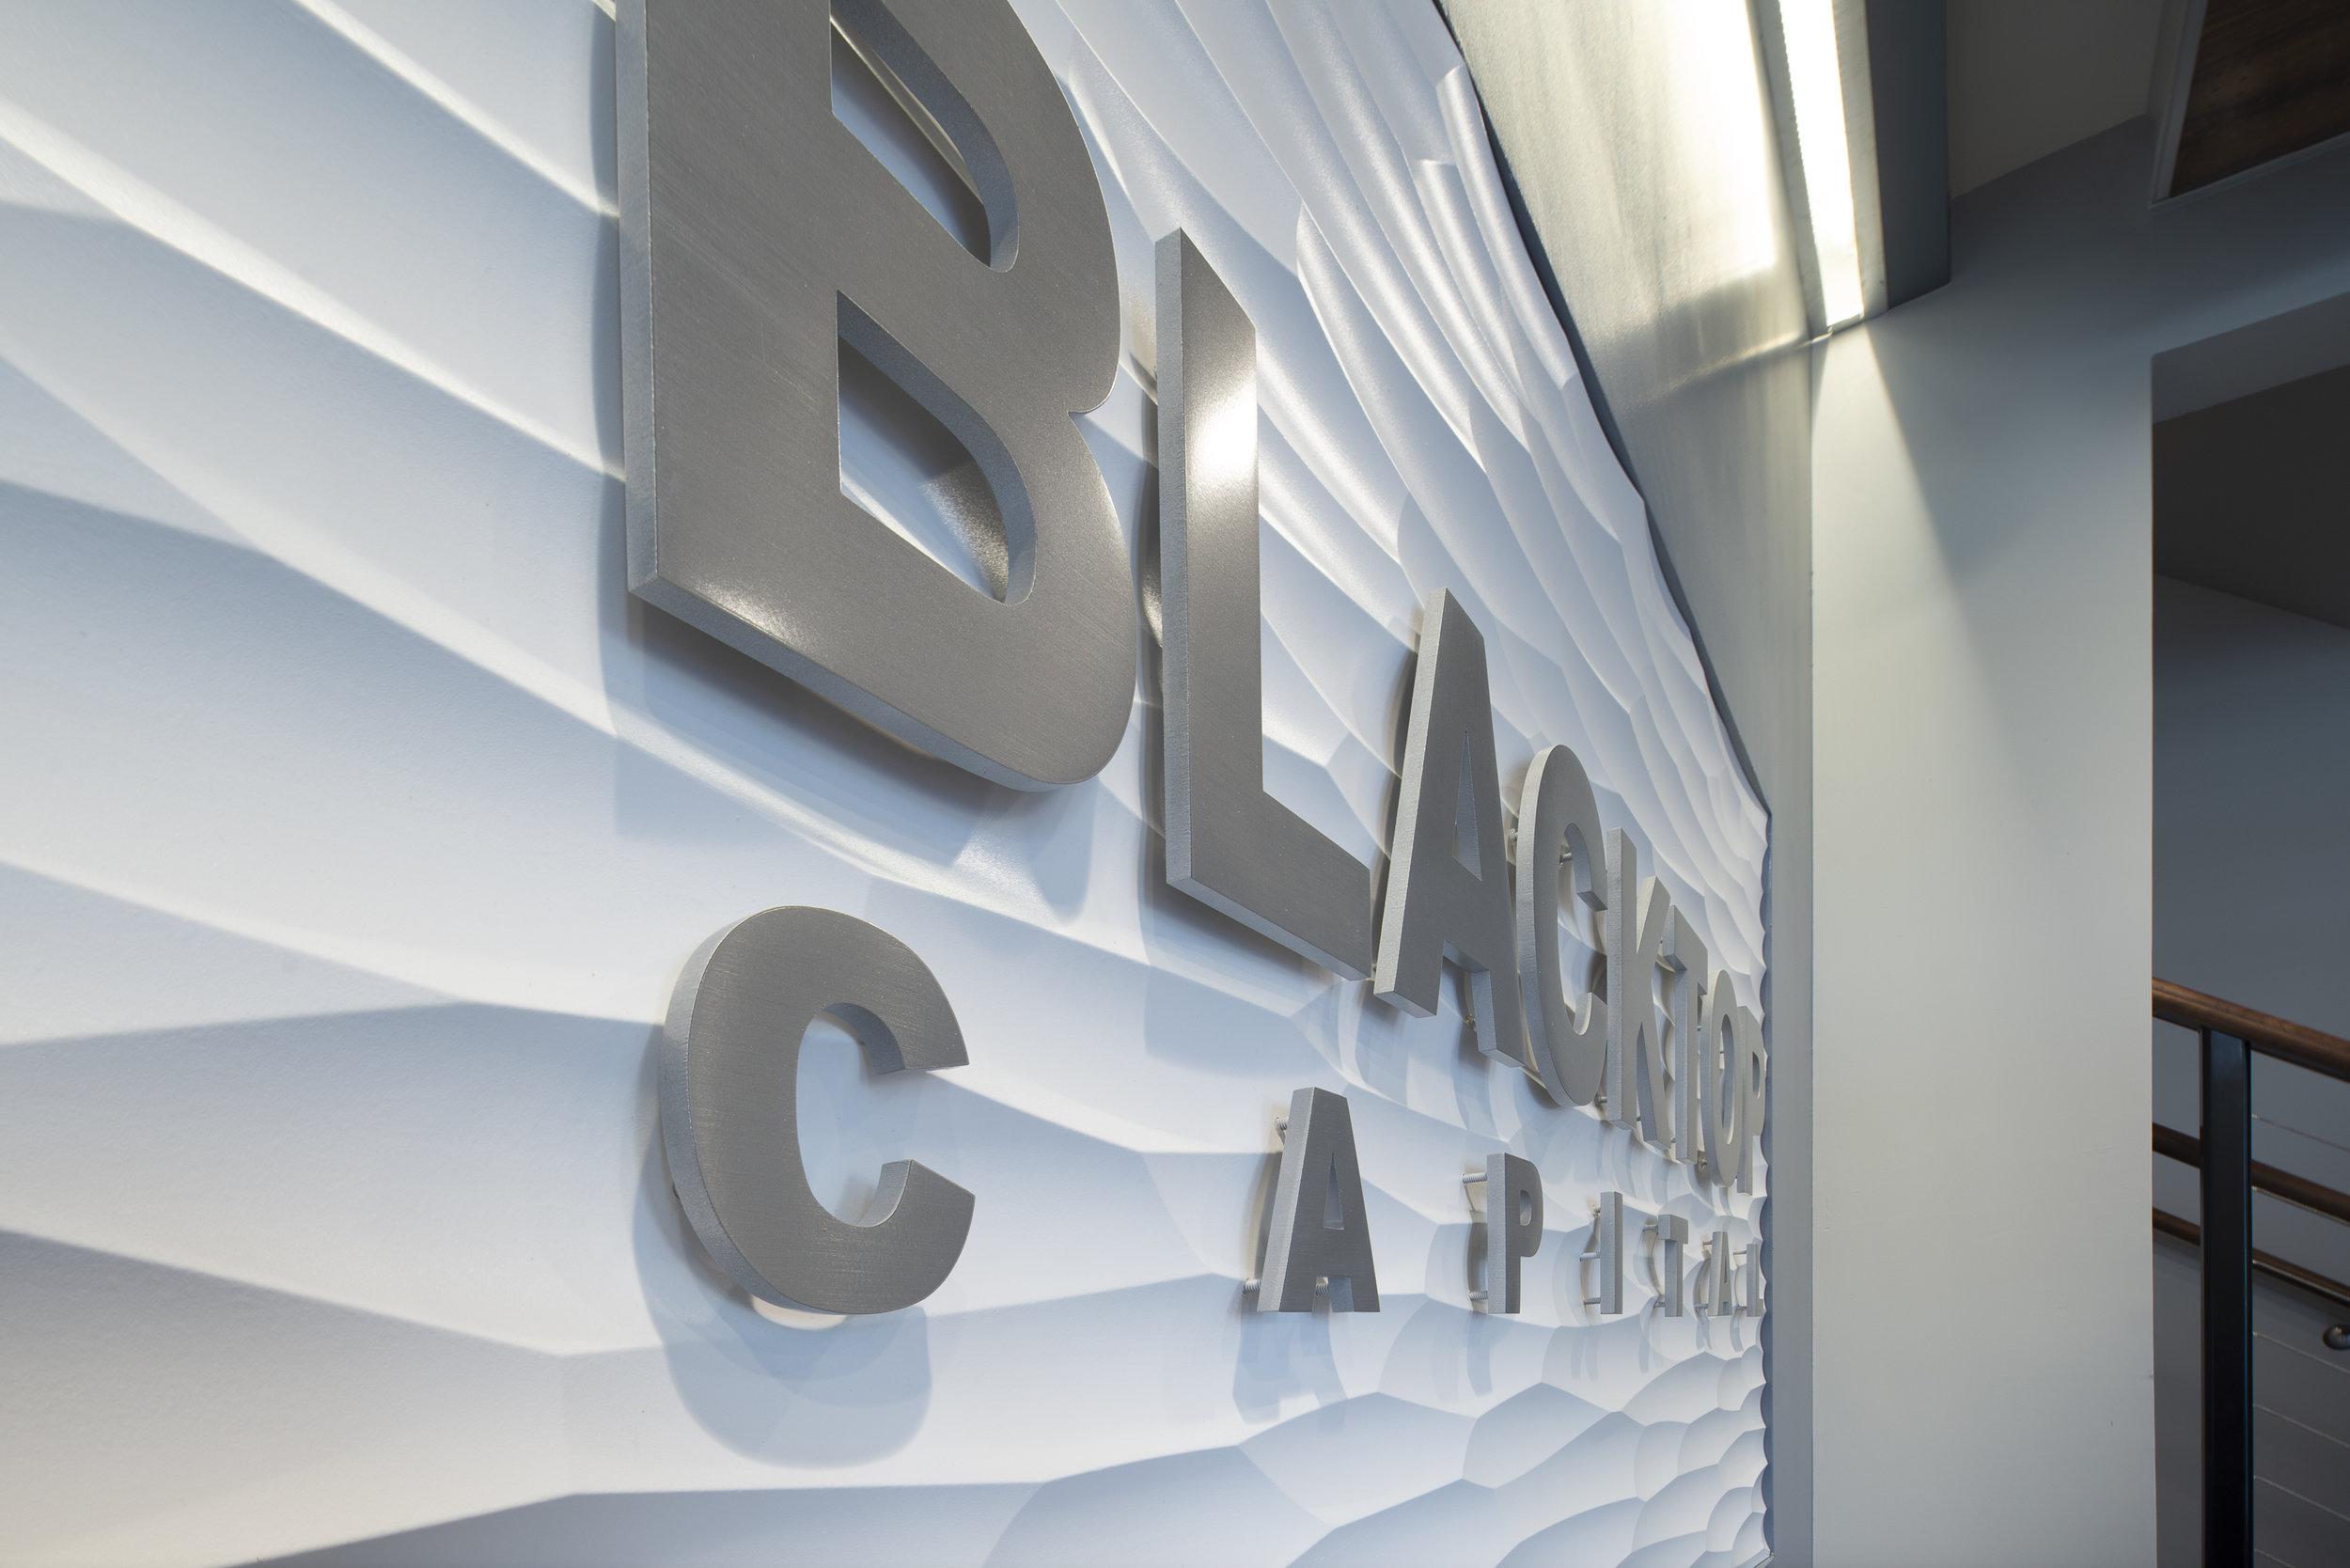 blacktop 3form